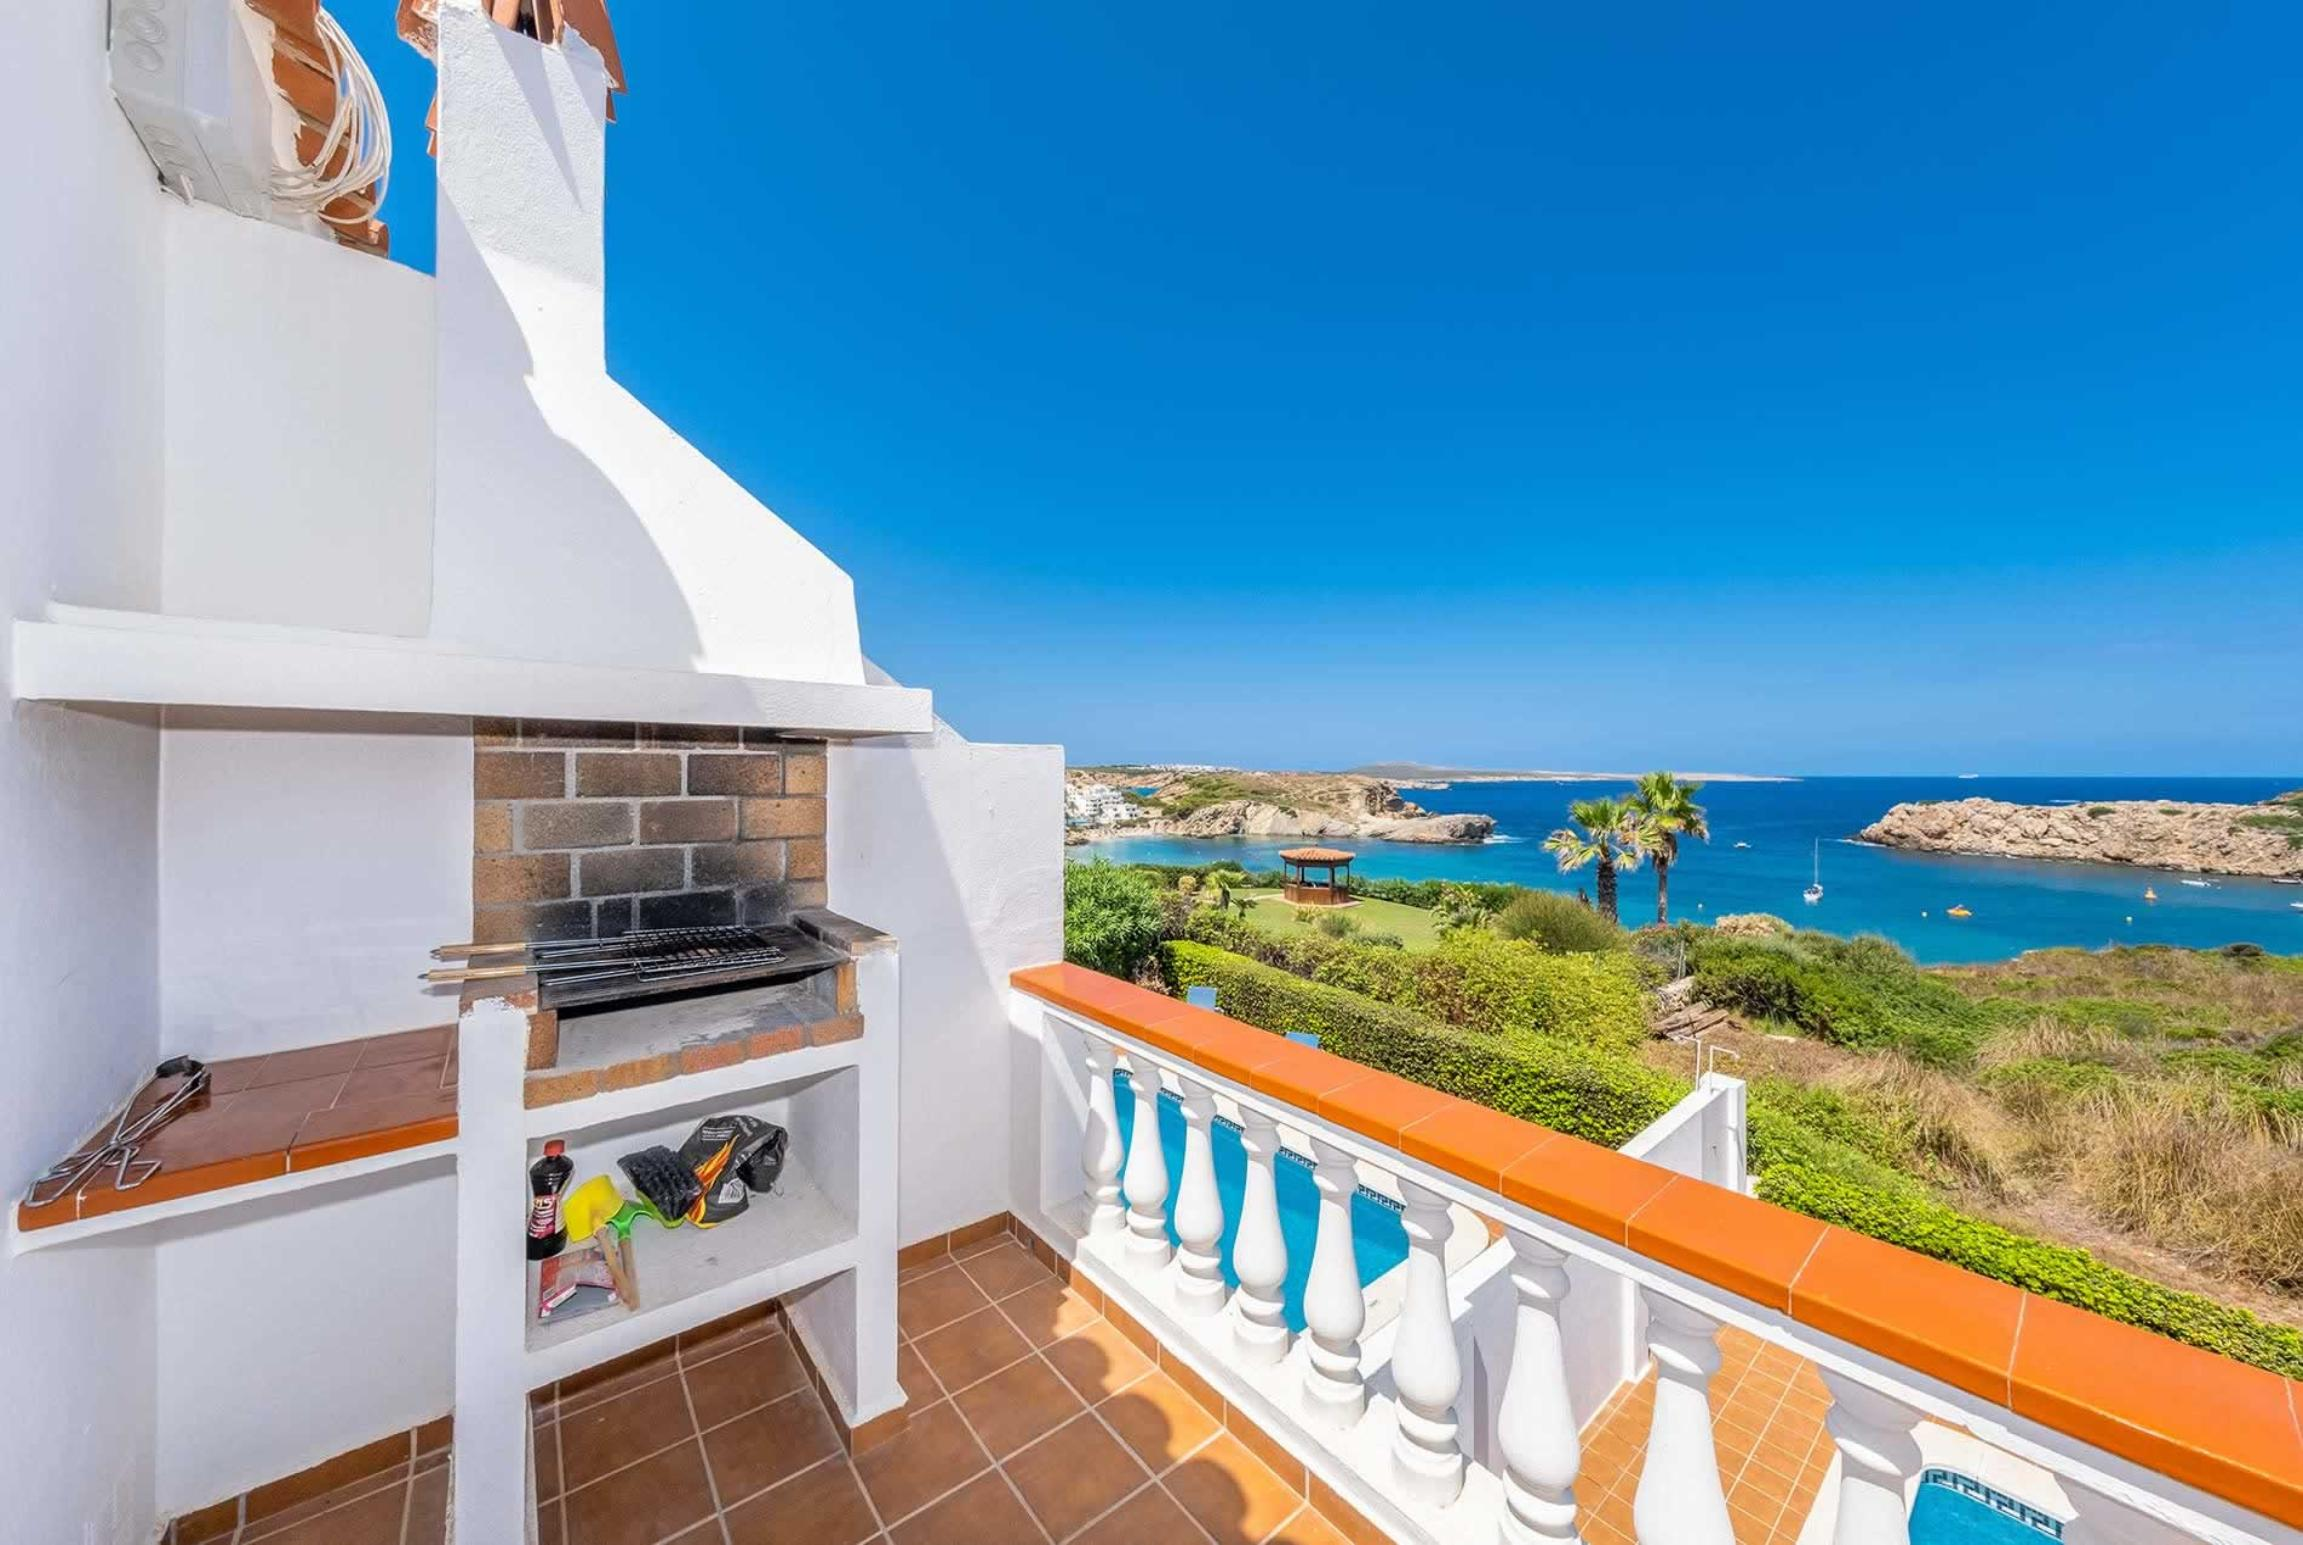 Ferienhaus Bellavista II (2654270), Arenal De'N Castell, Menorca, Balearische Inseln, Spanien, Bild 20